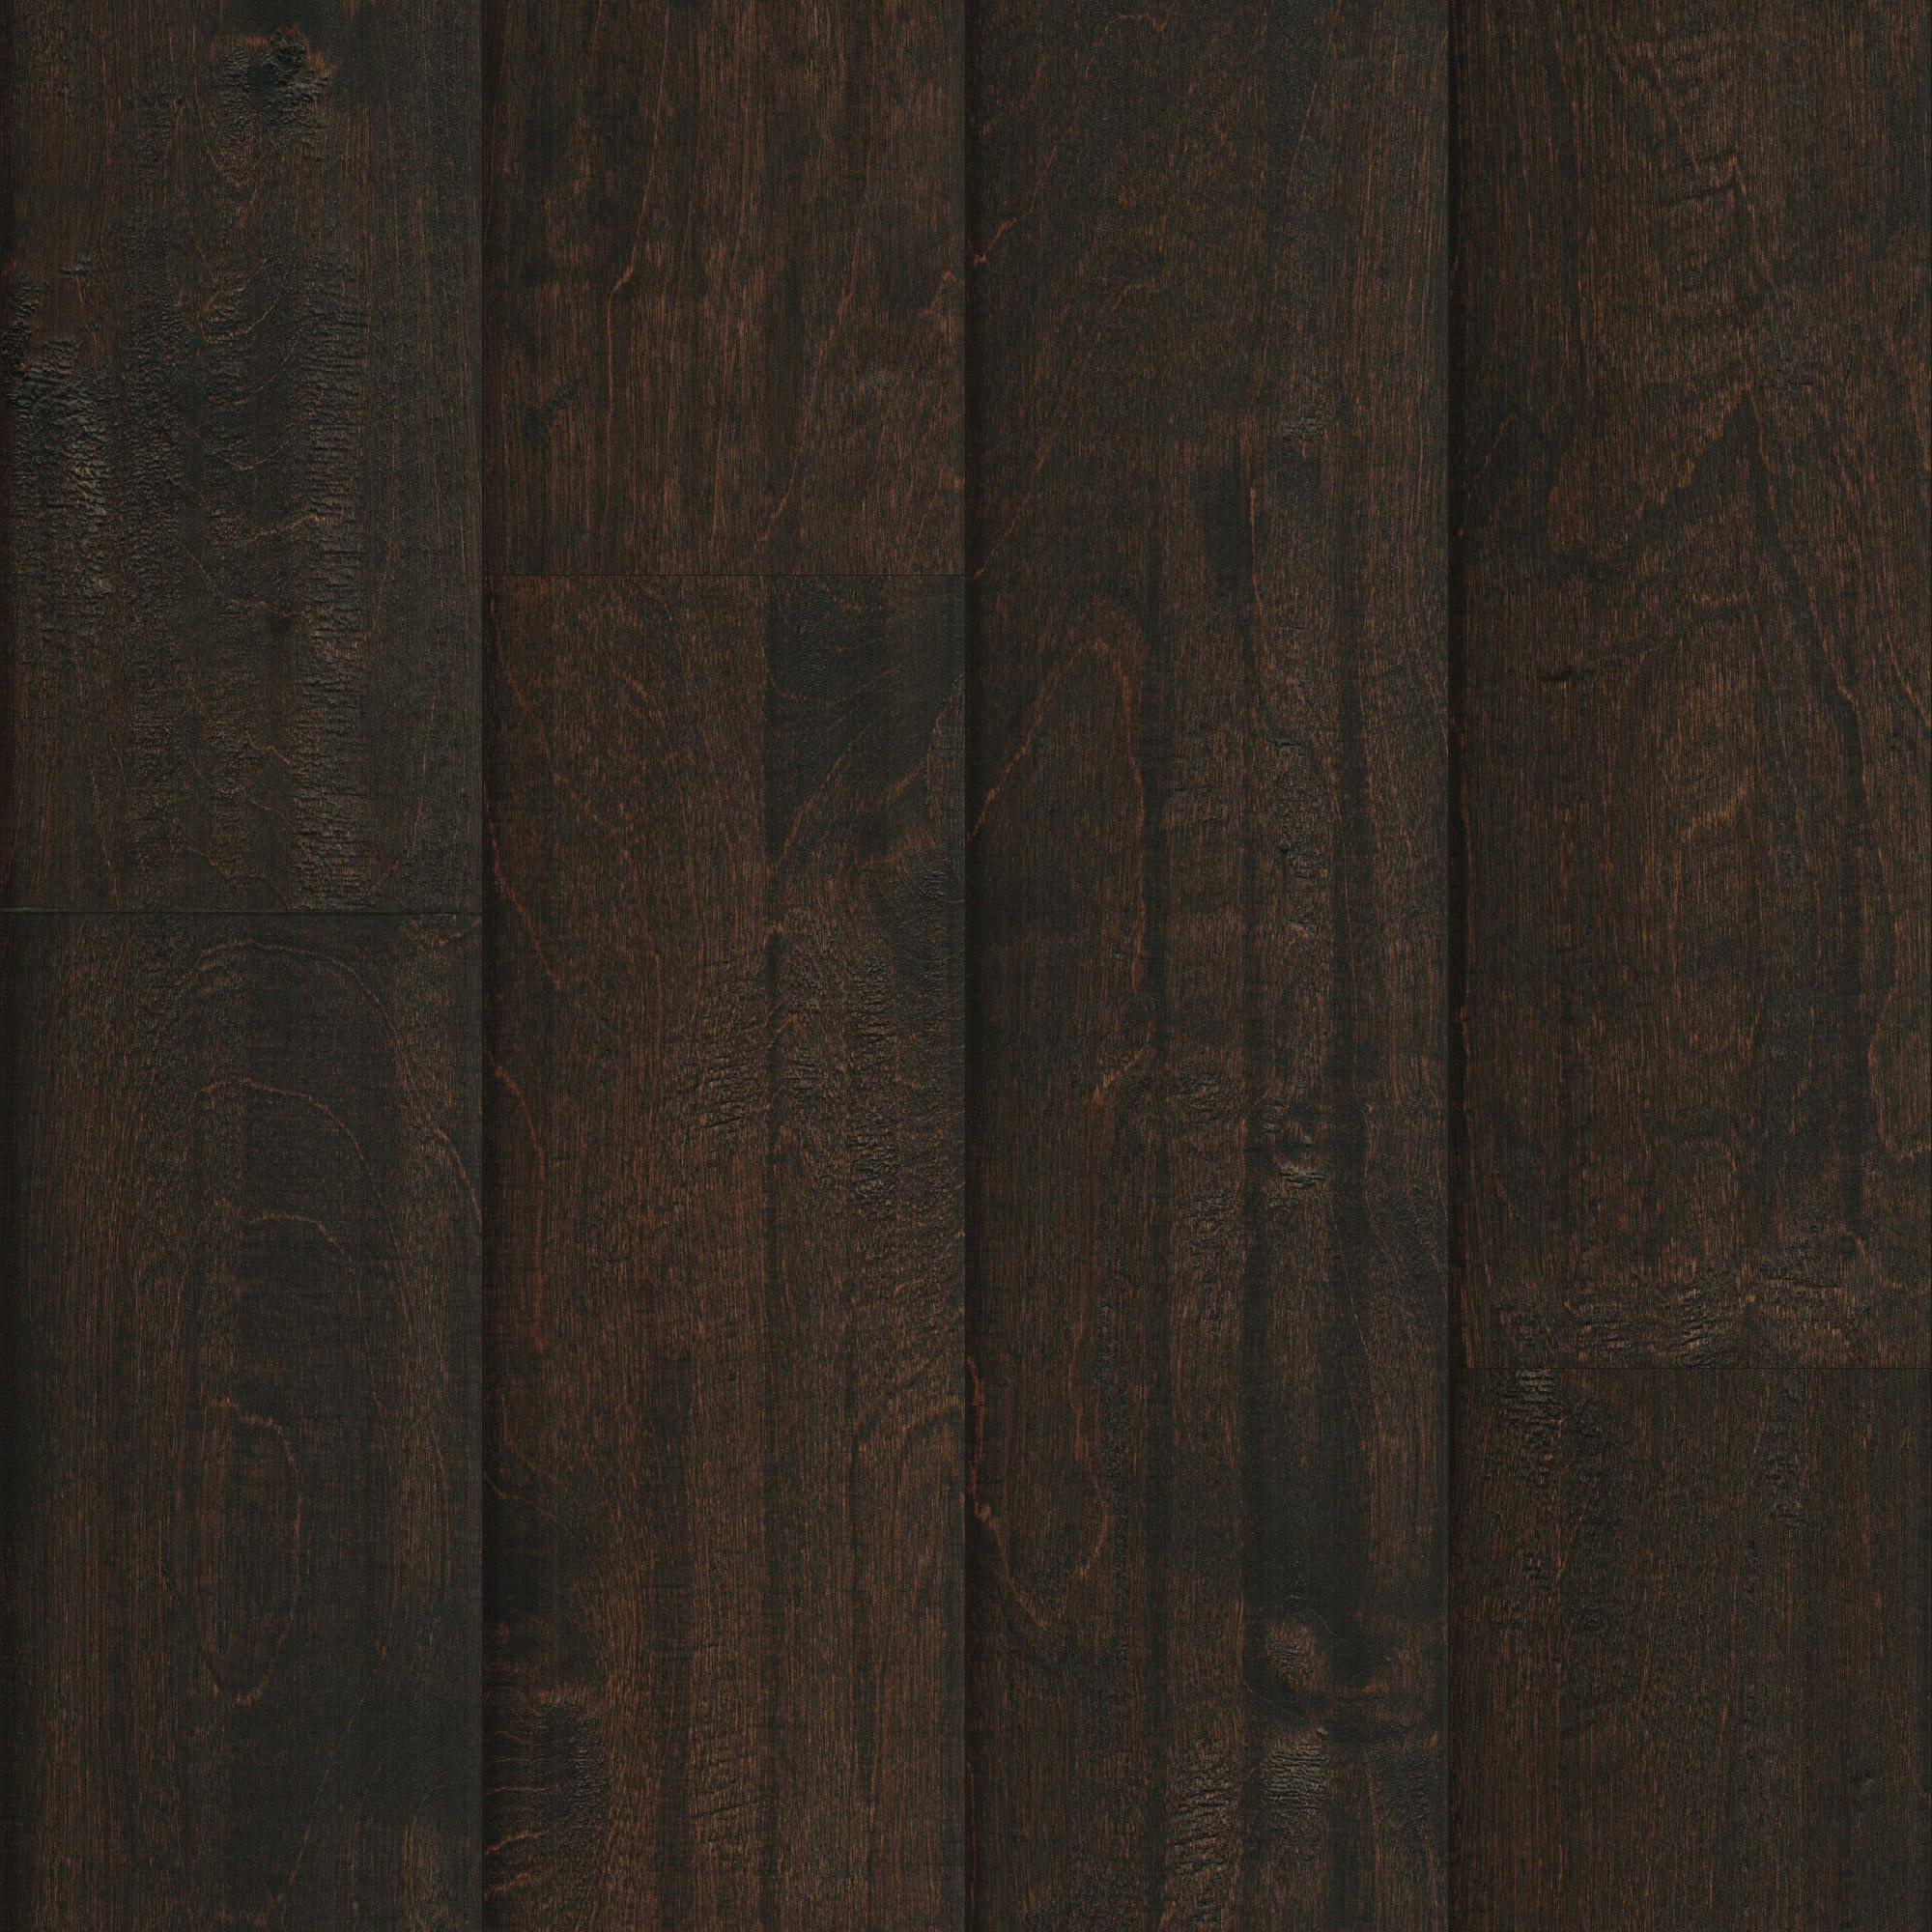 16 Fabulous Bruce Hardwood Floors Cost Per Square Foot 2021 free download bruce hardwood floors cost per square foot of mullican castle ridge birch espresso 5 engineered hardwood flooring with regard to file 447 31